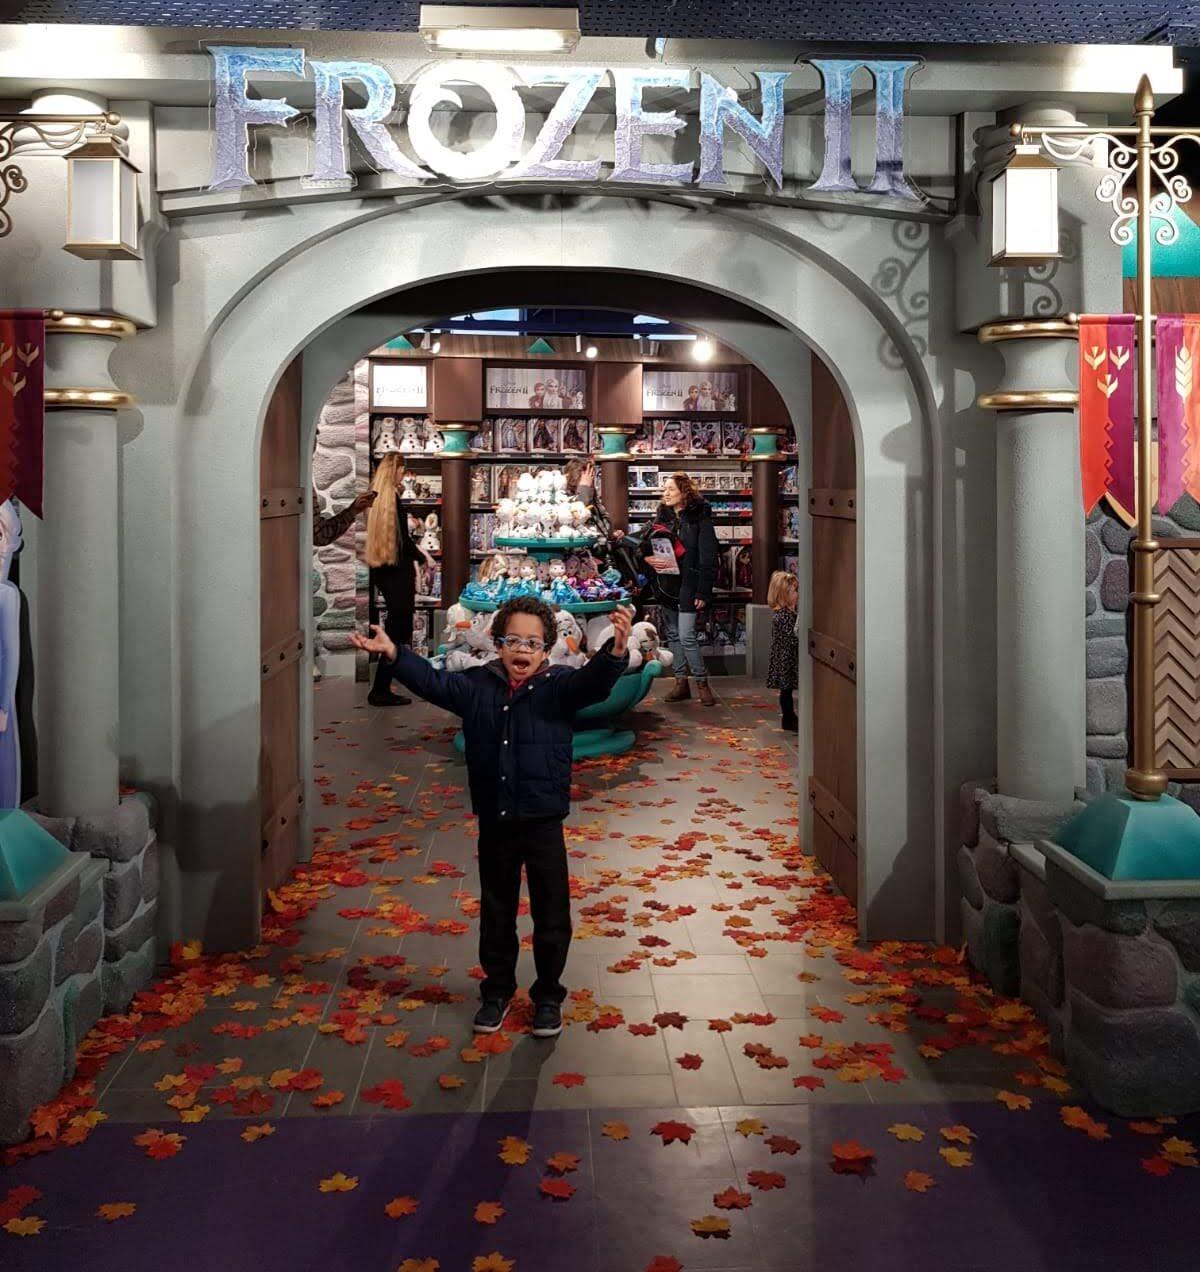 Frozen 2 – An adventure at Hamleys Magical Castle